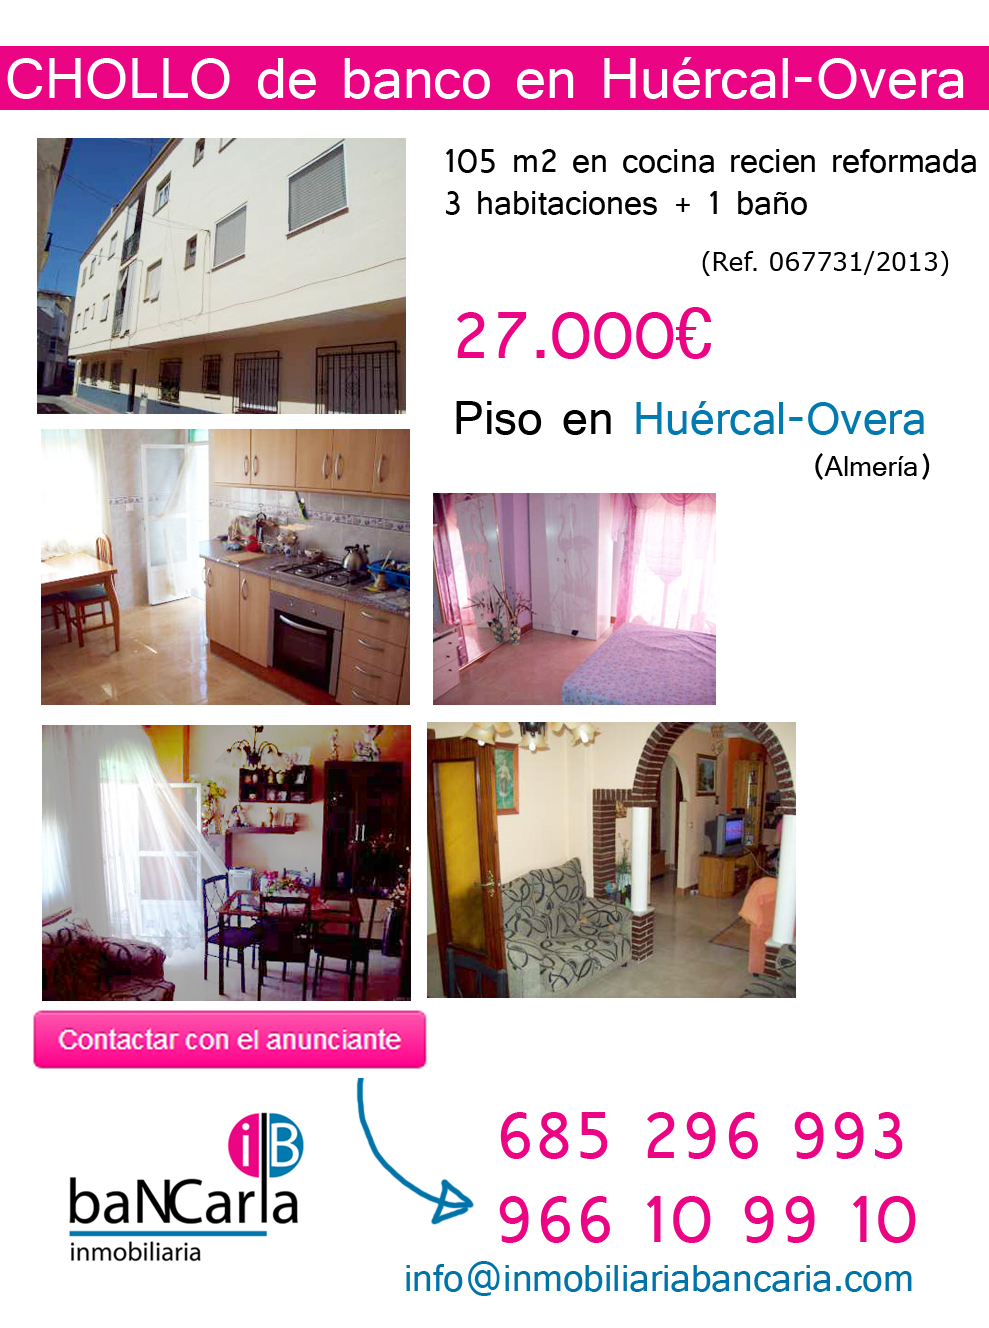 Piso-en-venta-de-banco-en-Huércal-Overa-Almería-Inmobiliaria